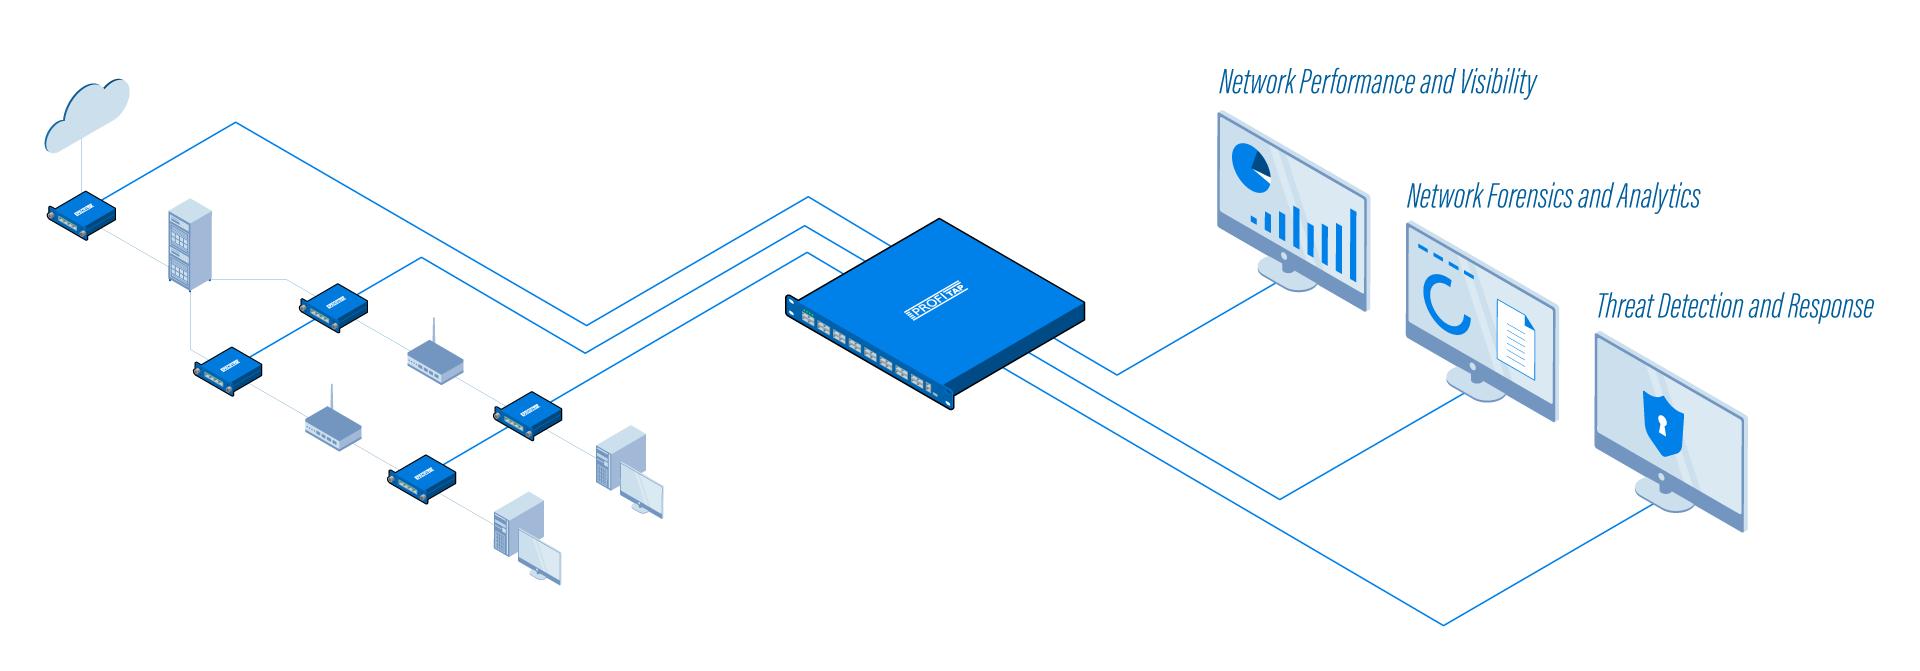 Network Packet Broker Diagram